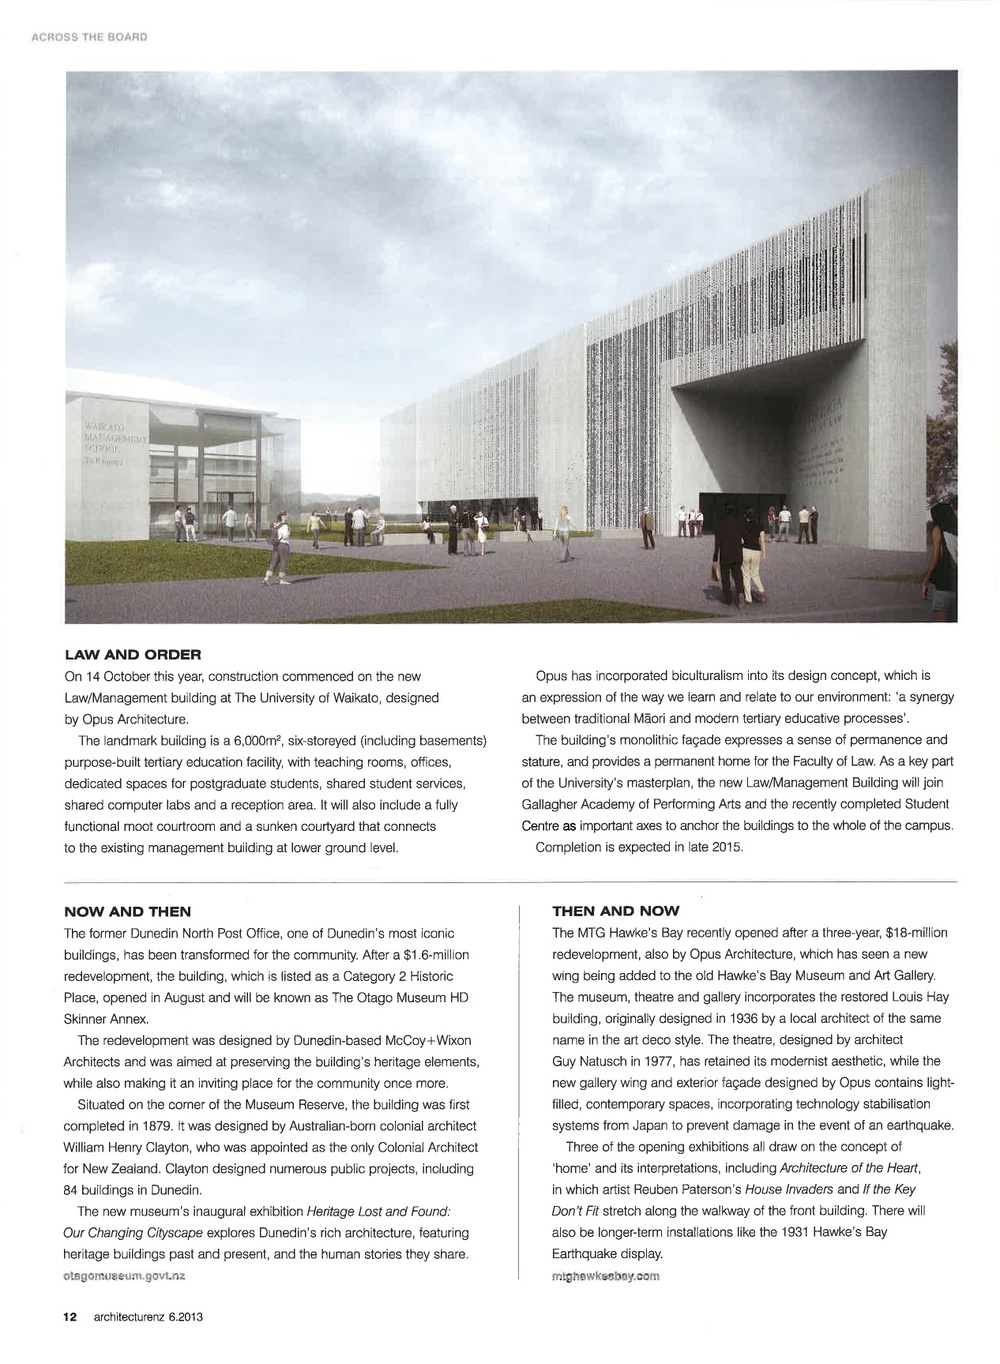 ArchitectureNZ June 2013_UoW_3.jpg